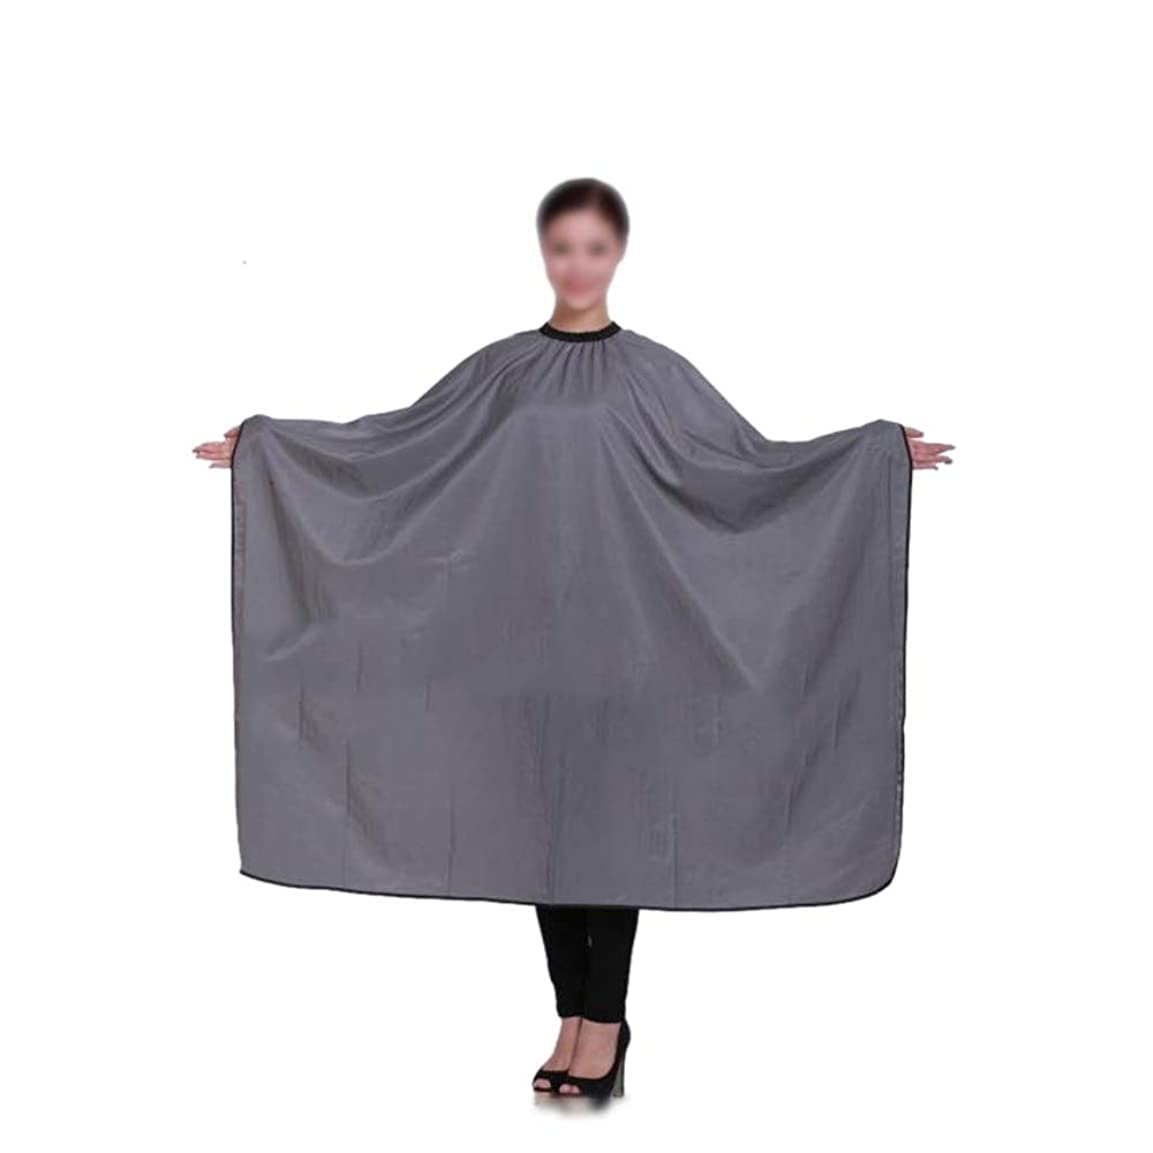 Xingfuzhijia 灰色の大広間のヘアカットのエプロン、毛の切断の防水布のスタイリングドレス